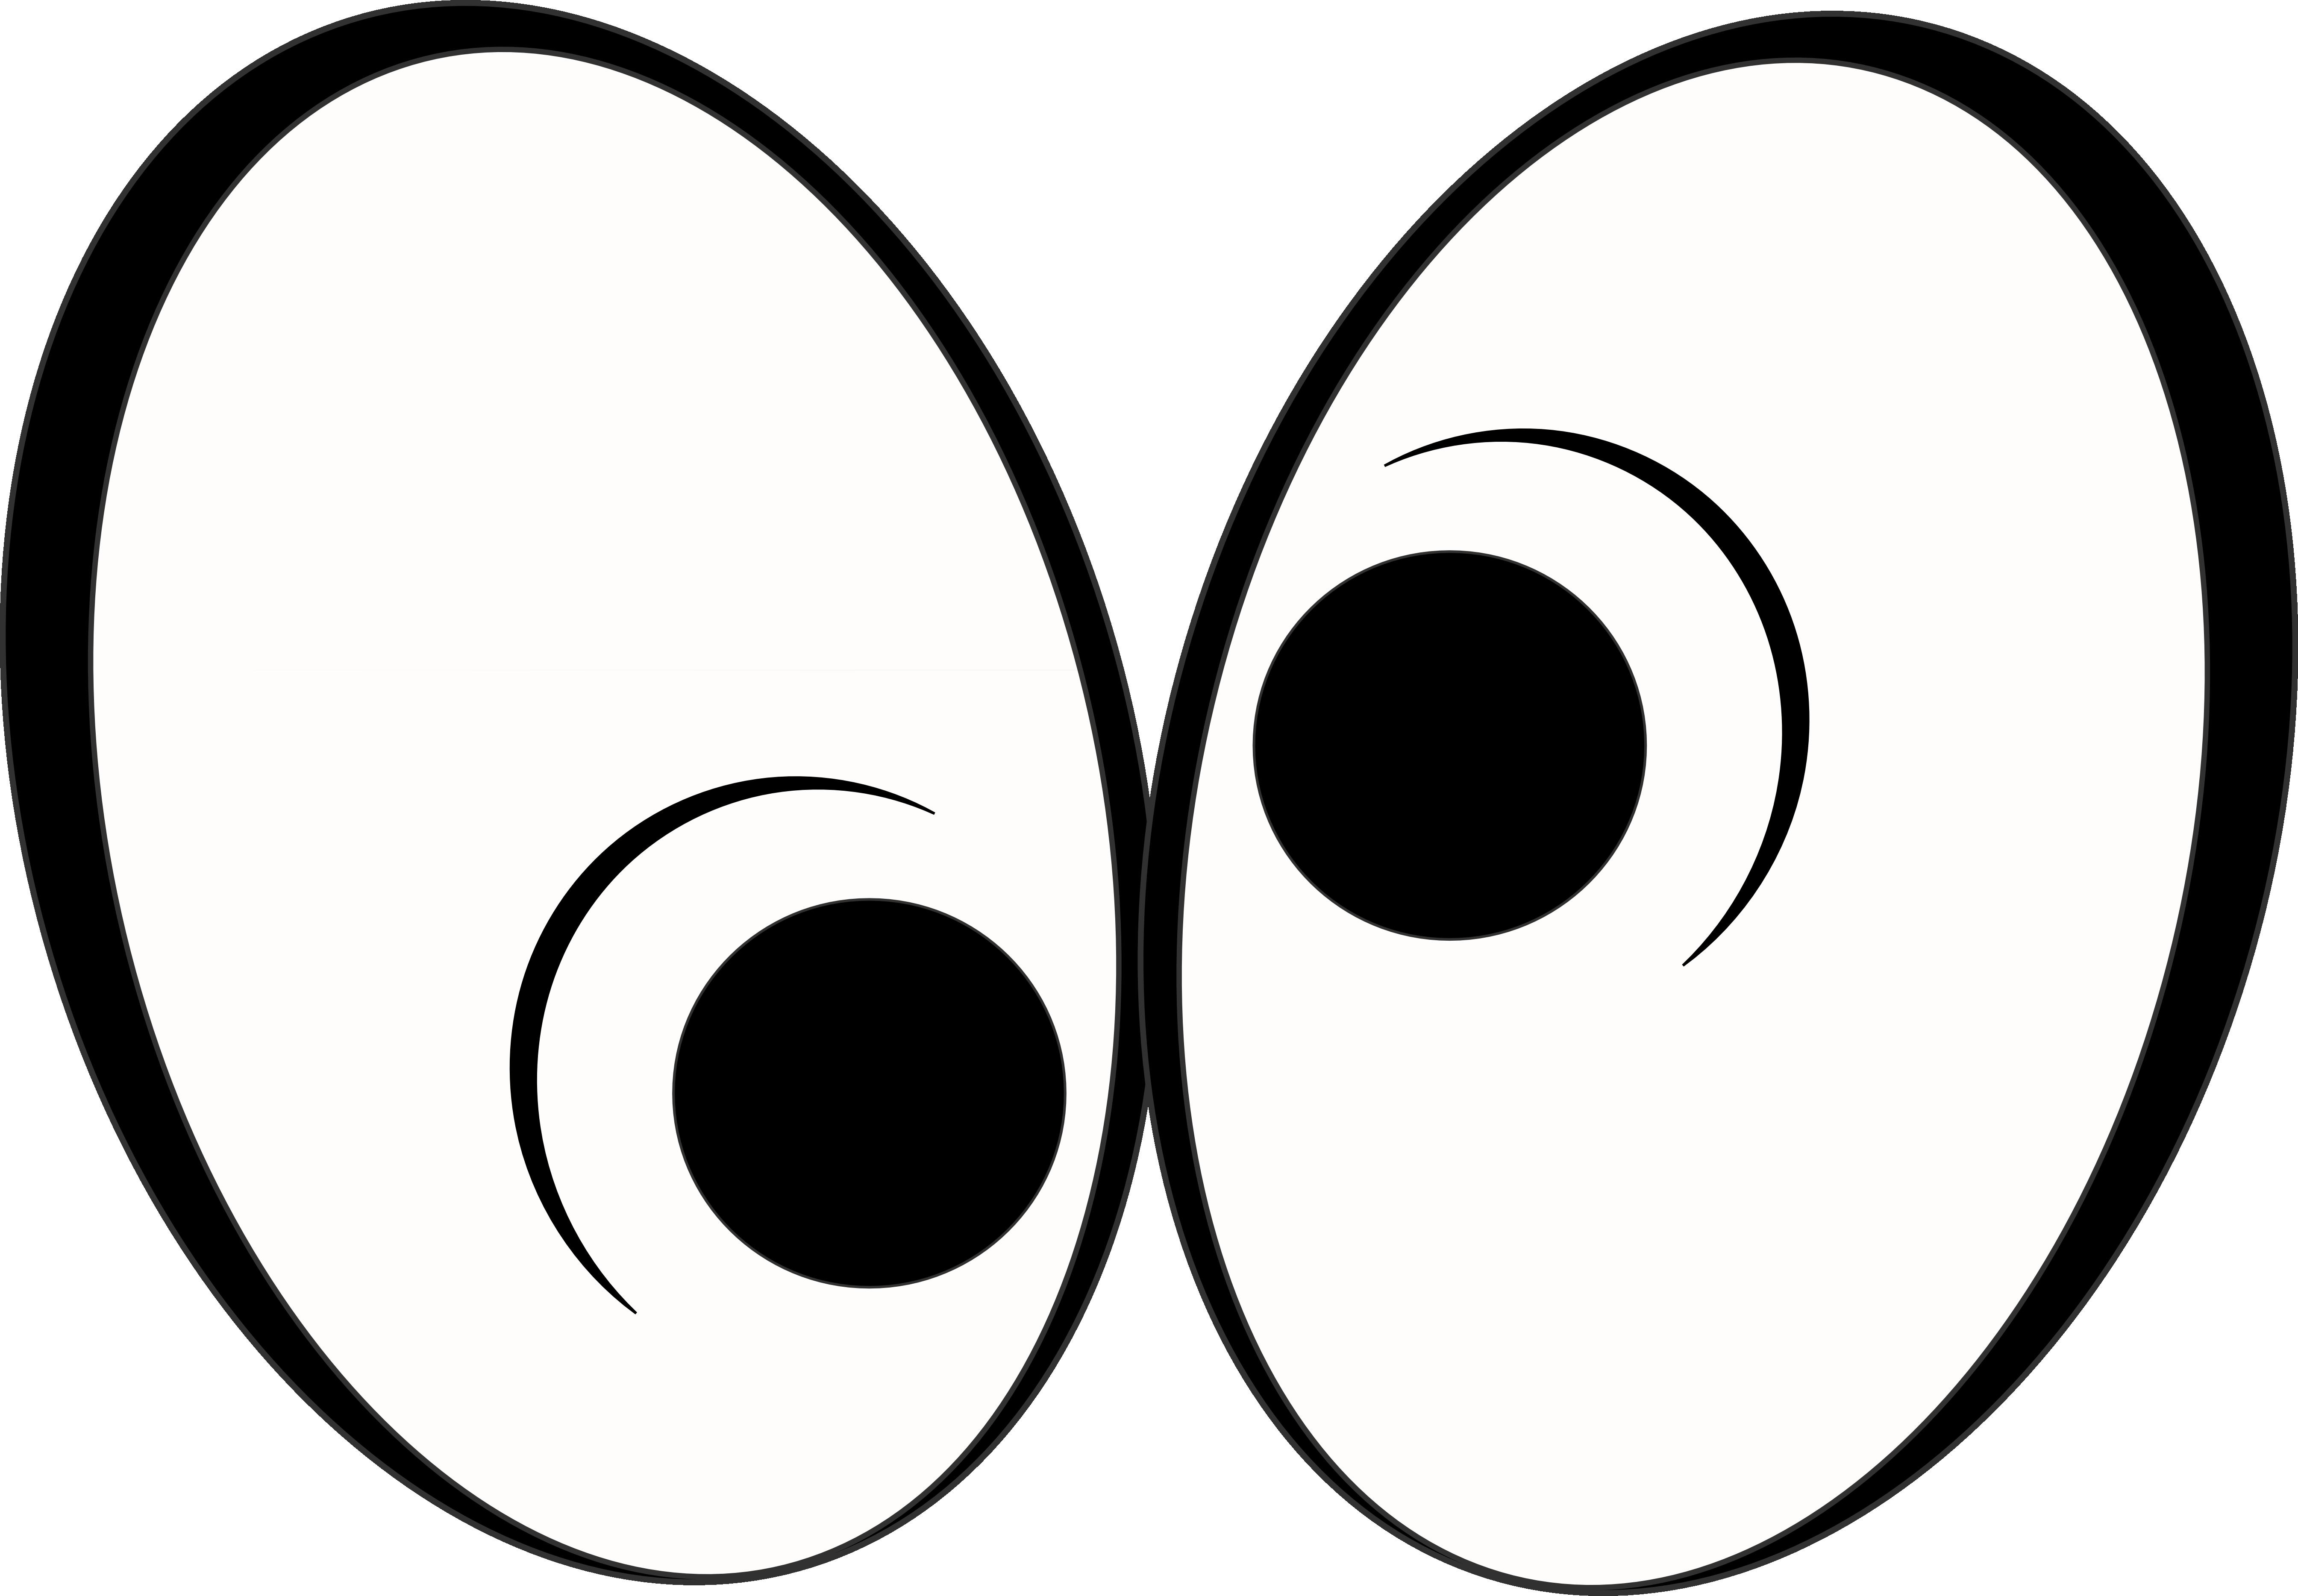 5378x3736 Cartoon Image Of Eyes Looking